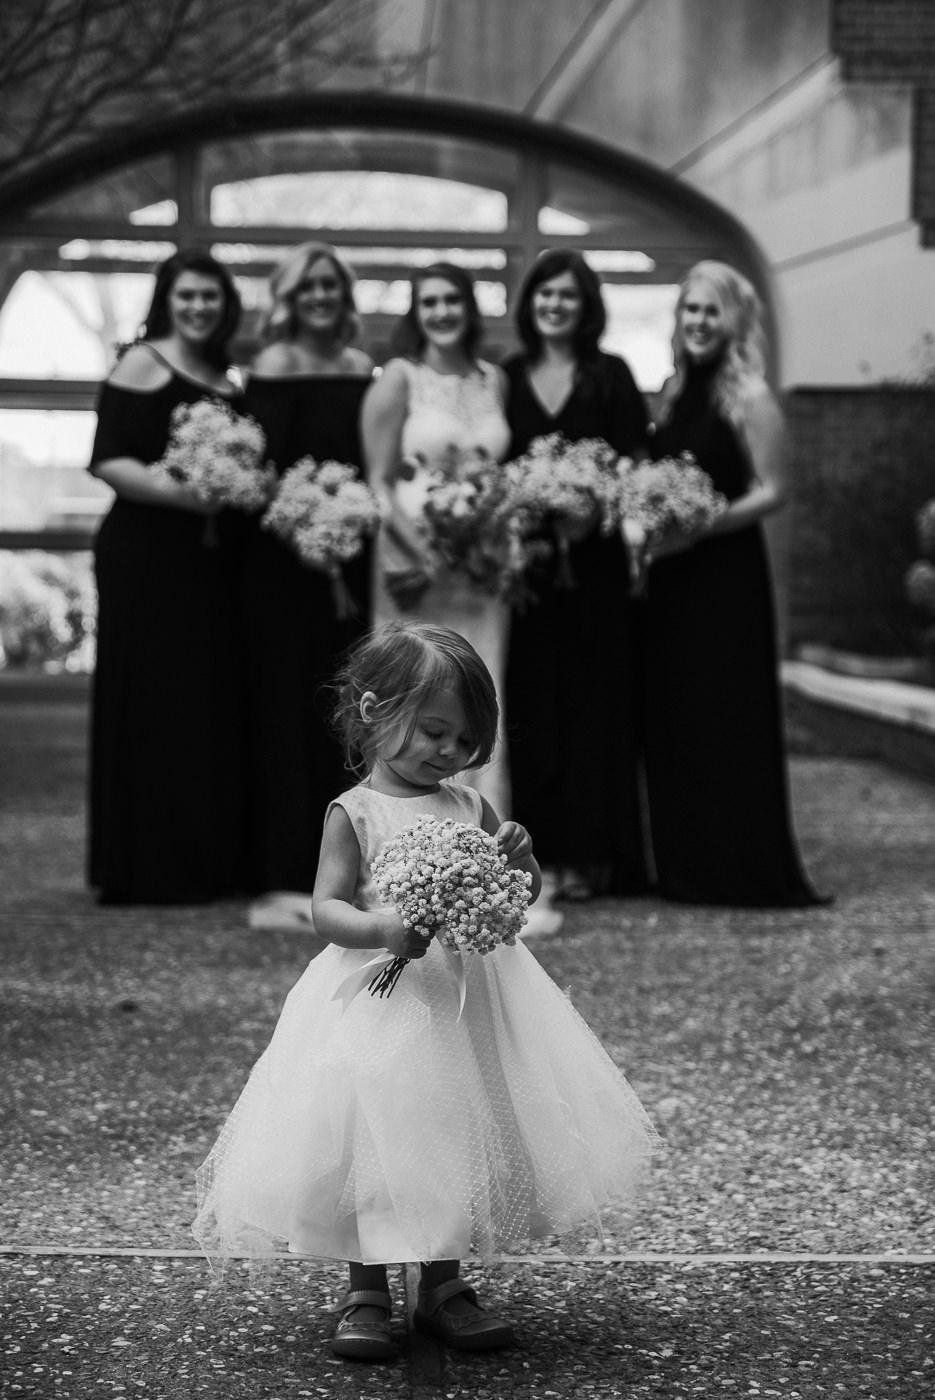 rogers.arkansas.weddingphotos.©2018mileswittboyer-9.jpg